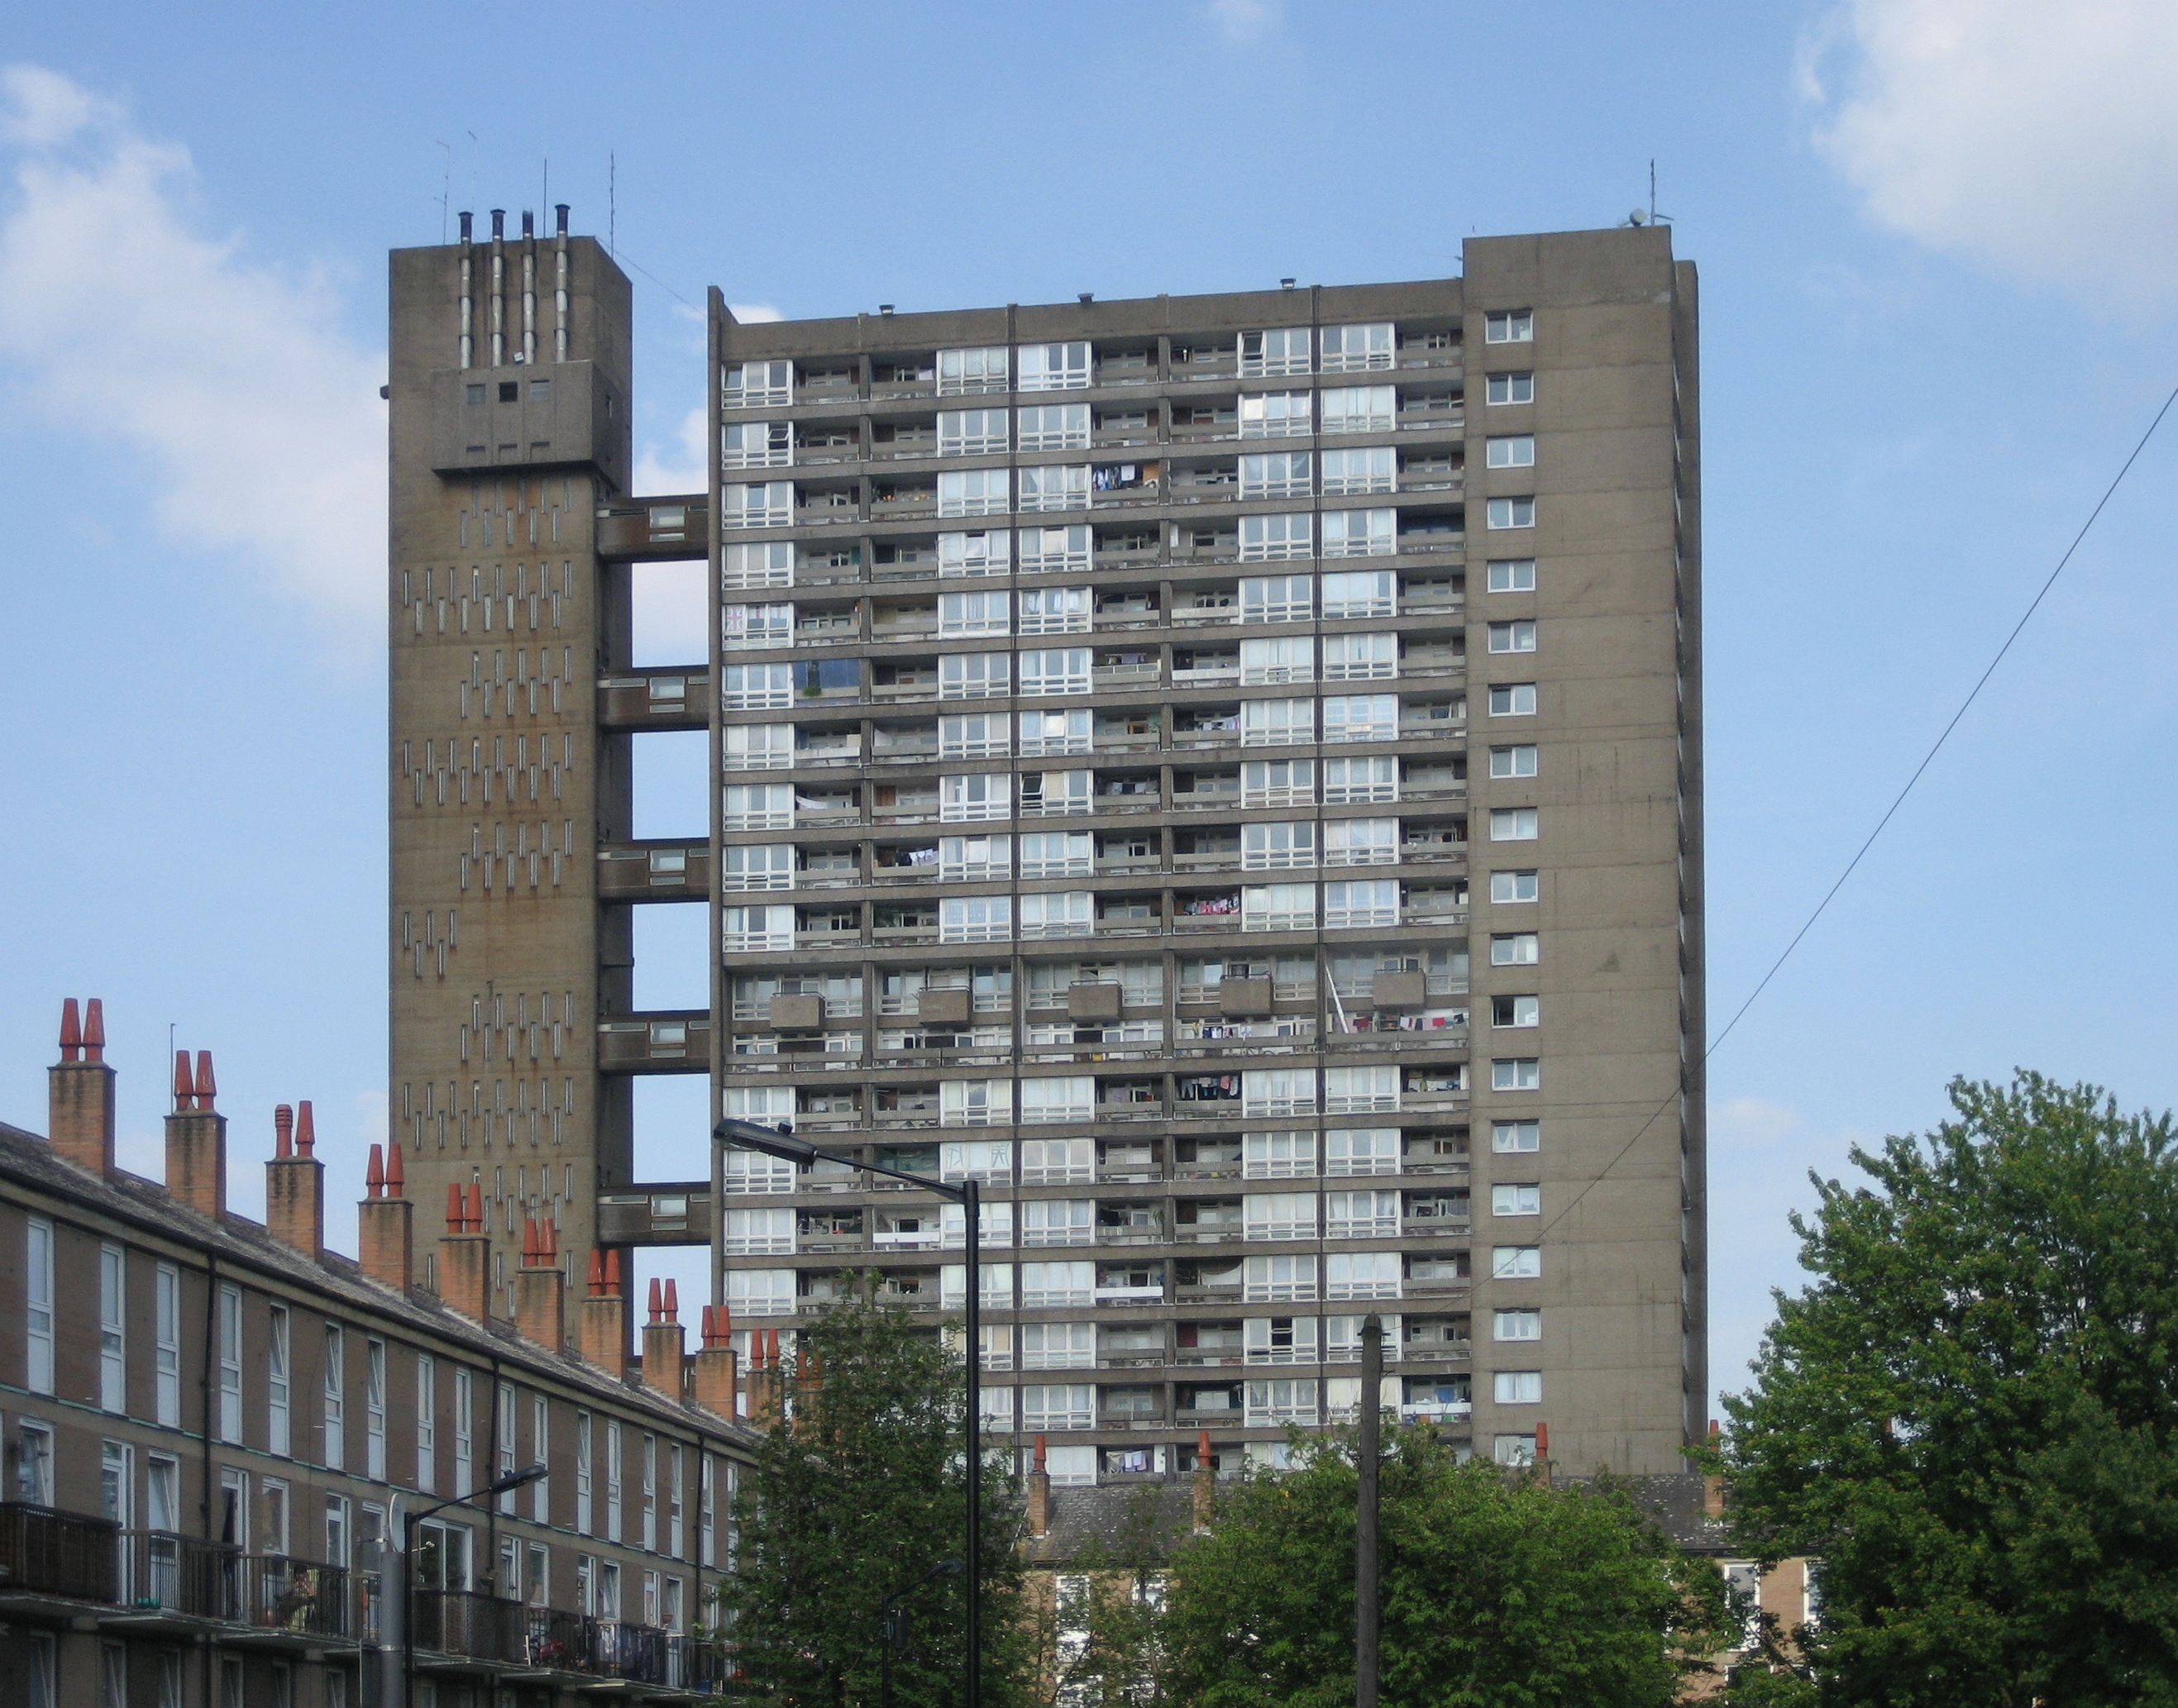 Opinie Harm Tilman - High-rise: wonen in hoge dichtheid